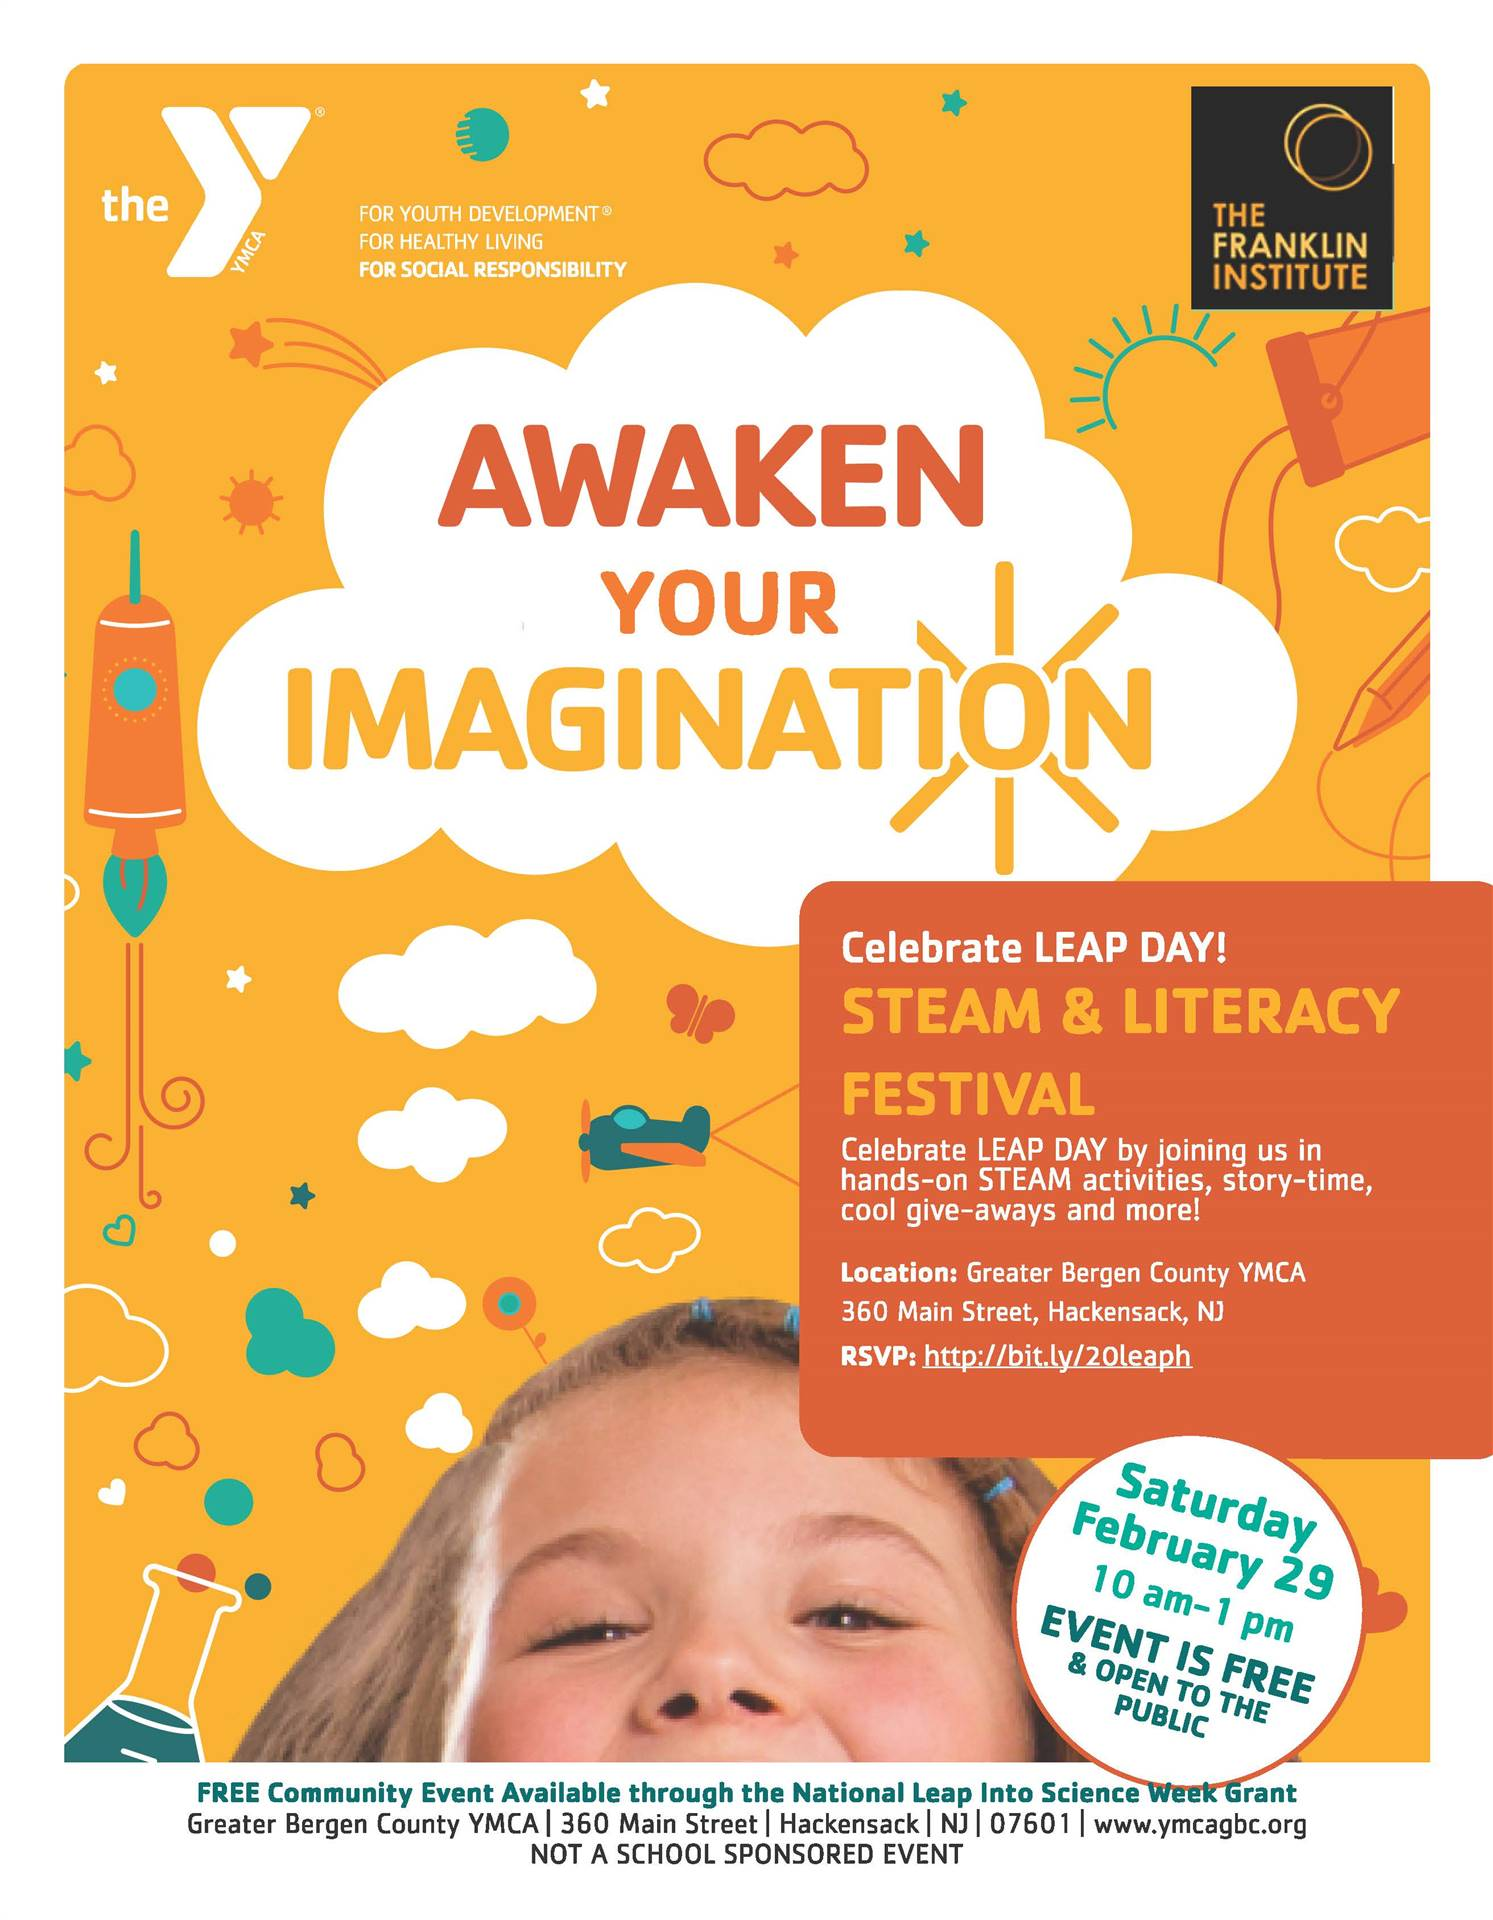 STEAM & Literacy Festival